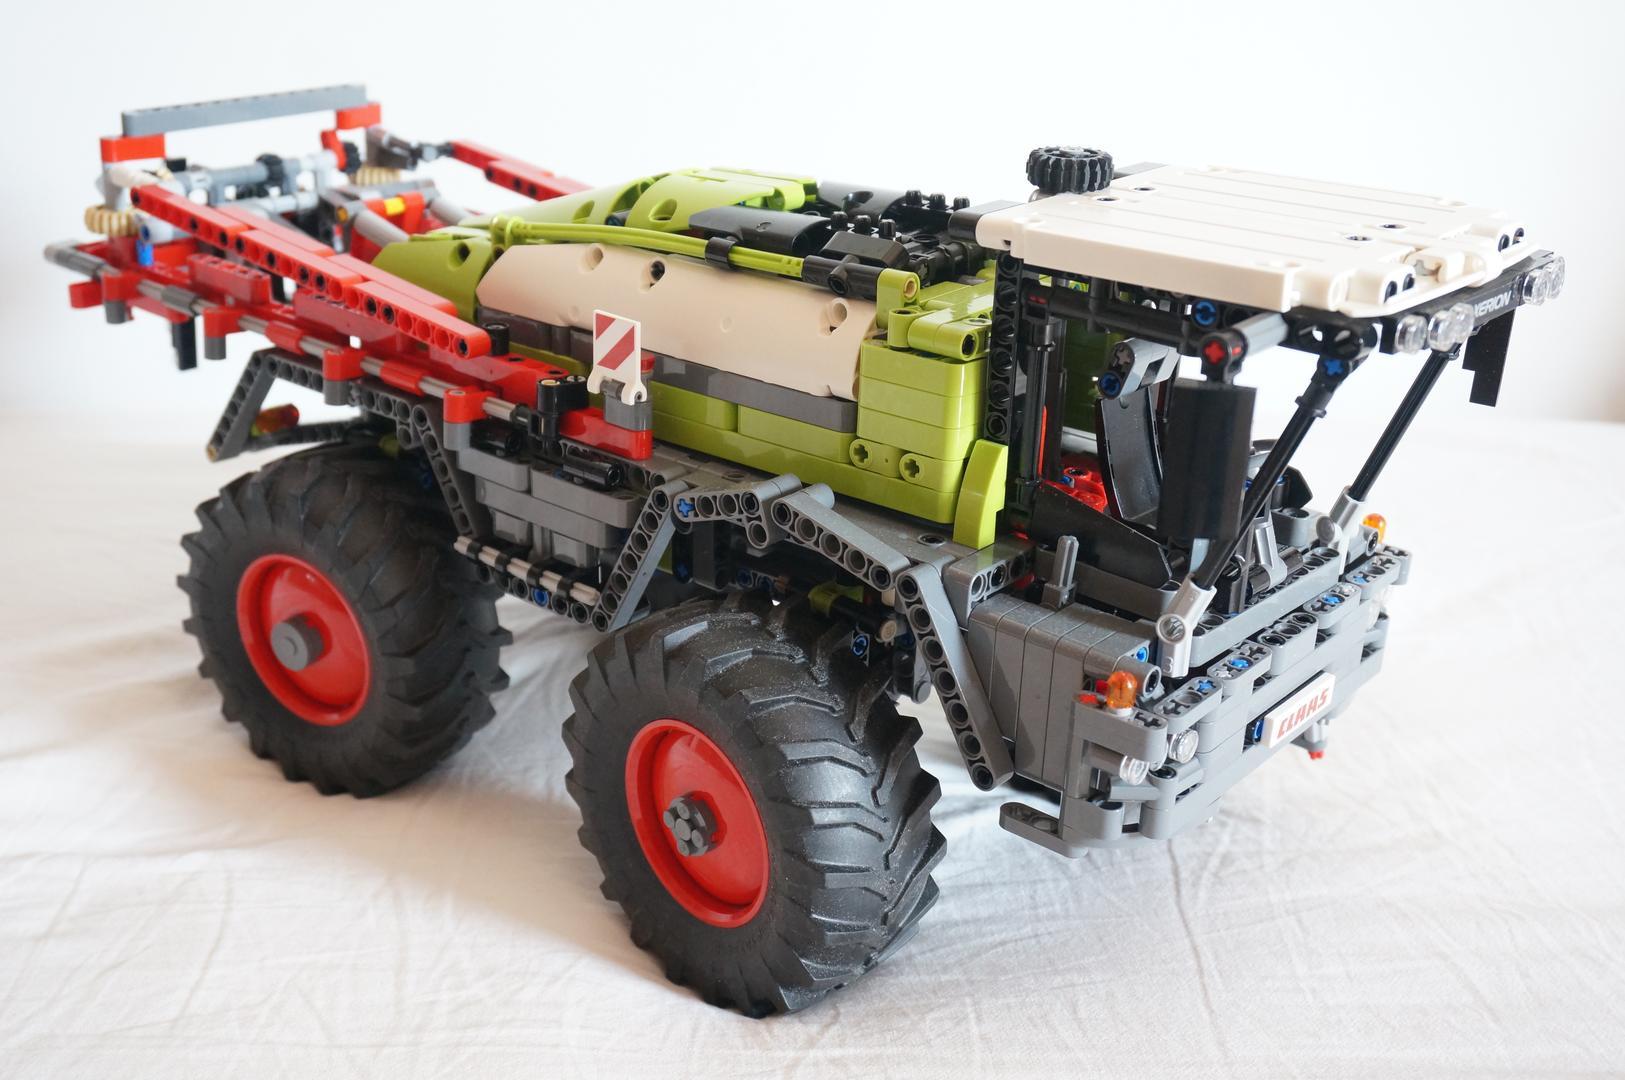 TECHNIC MOC-9356 Crop Sprayer | 42054 C Model by BrickbyBrickTechnic MOCBRICKLAND